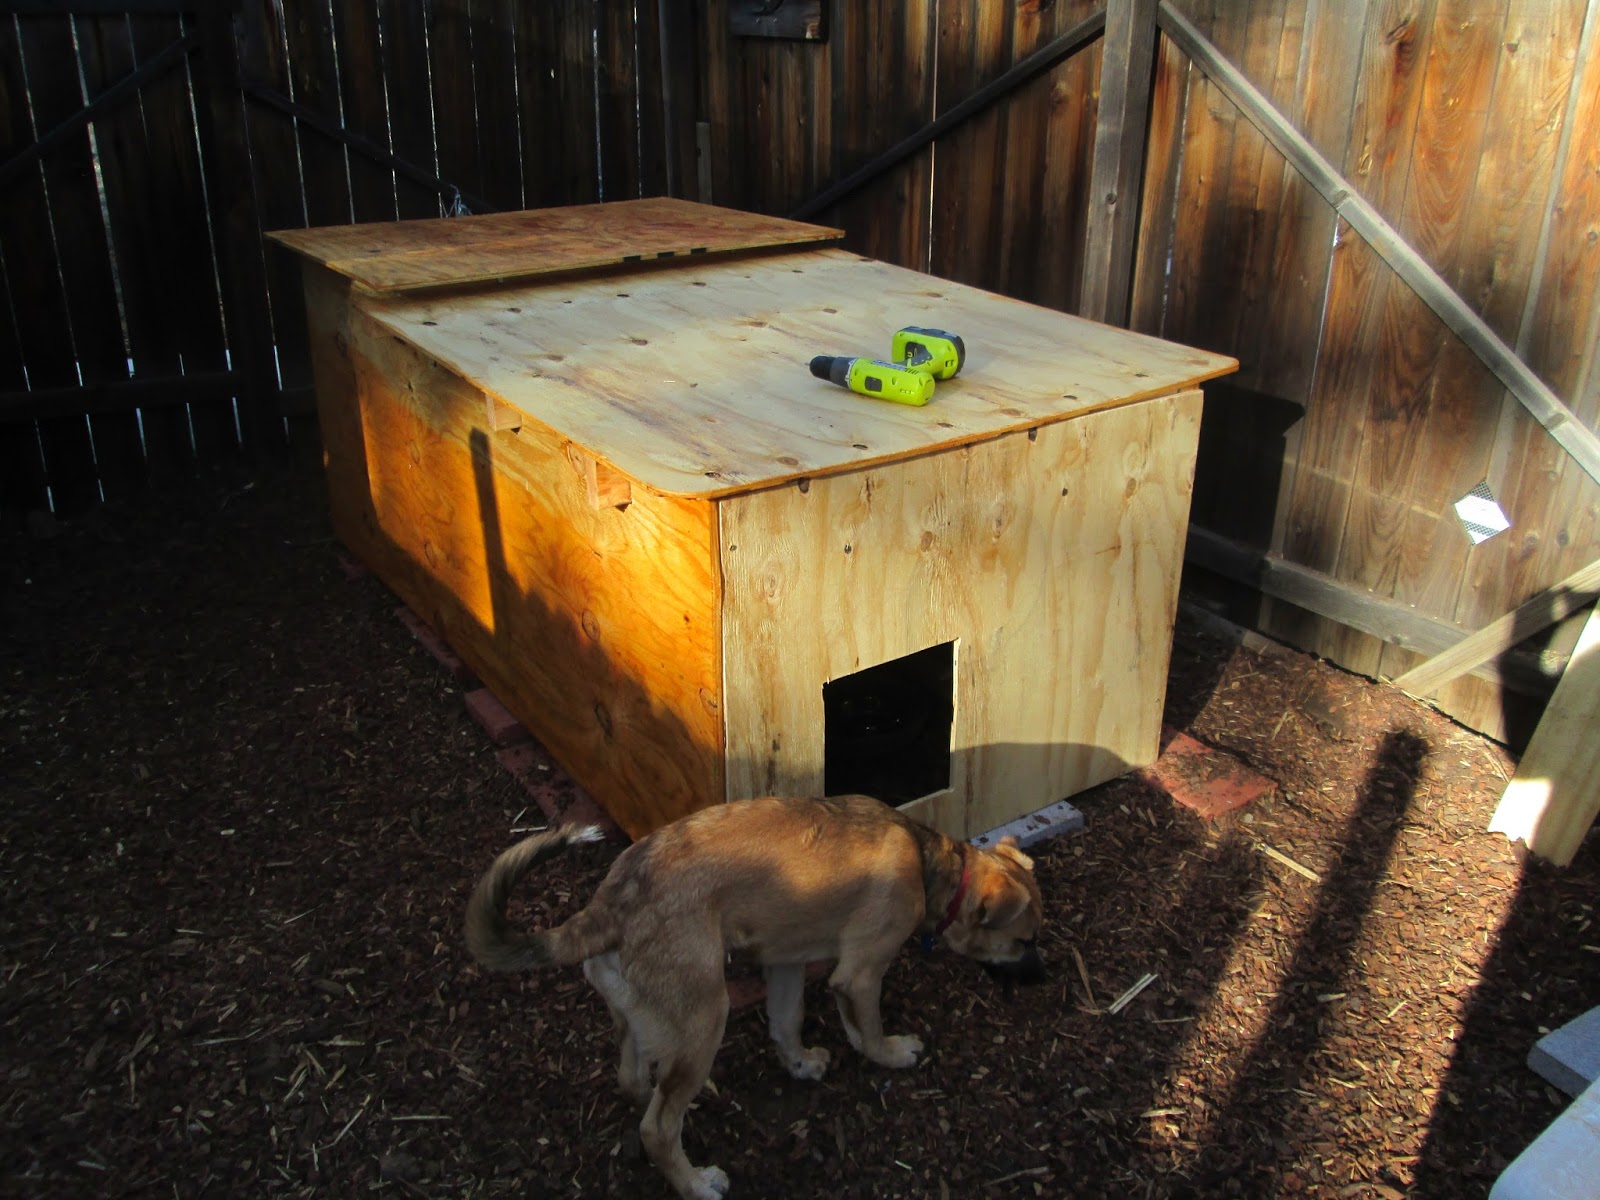 Ancient Pathways Survival School, LLC: DIY Dog House Plans